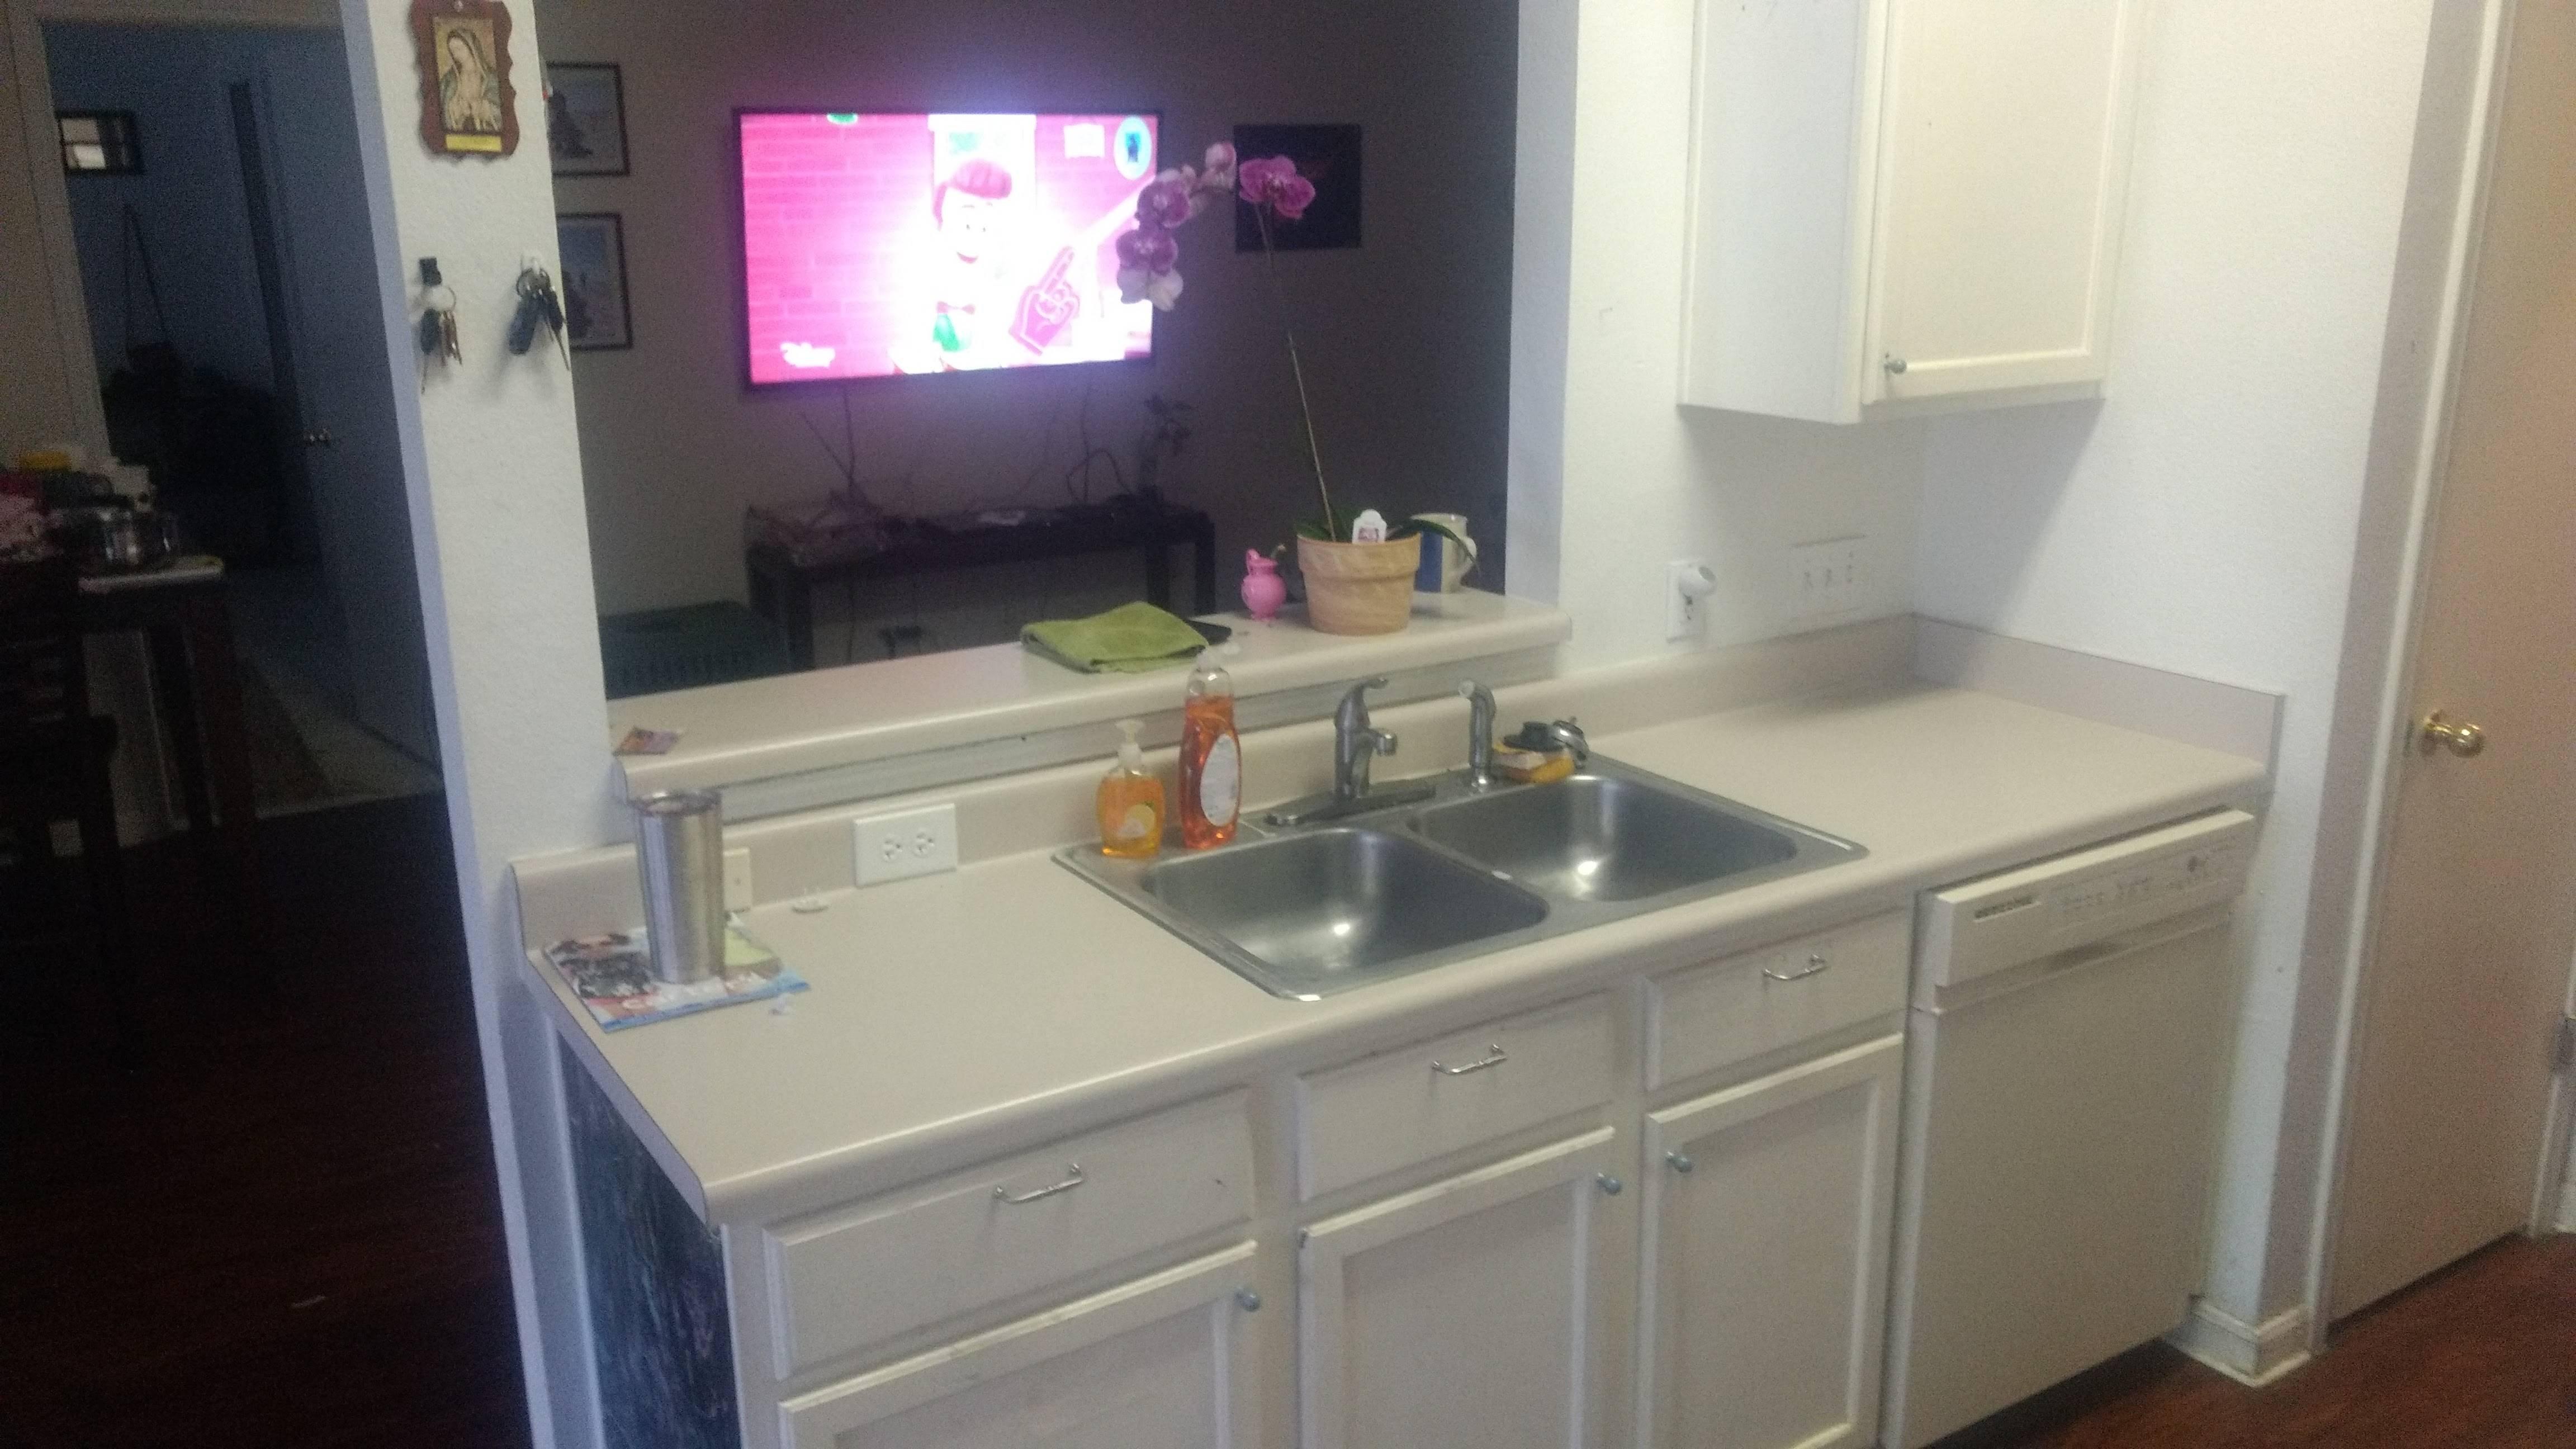 Budget Kitchen Remodel - $5000